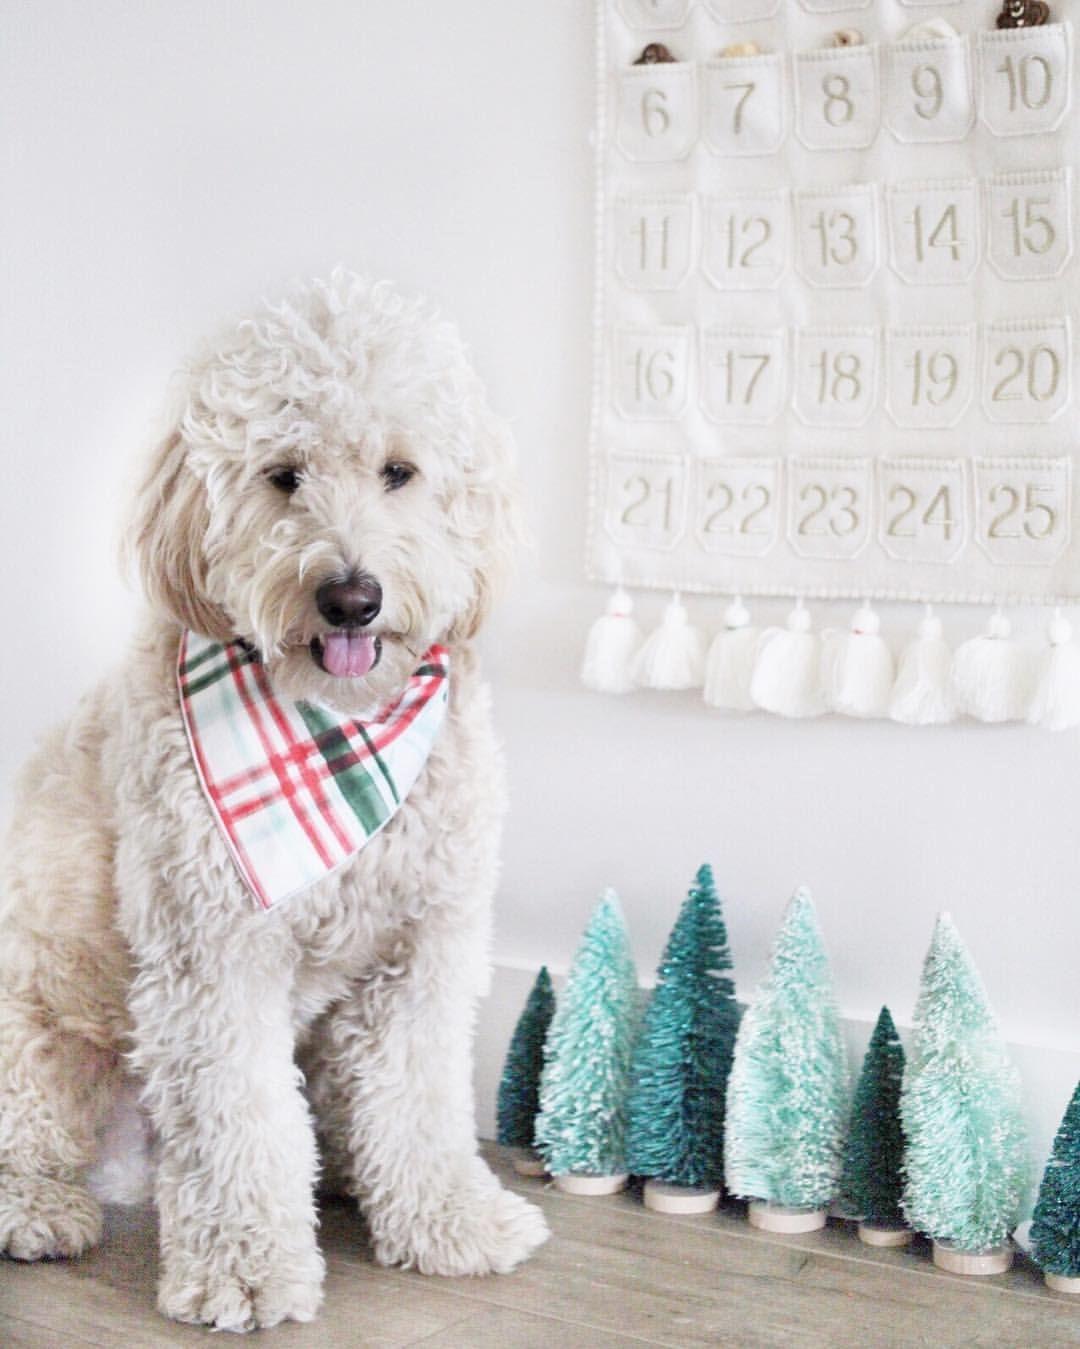 Puppy Christmas Countdown Cute Dog